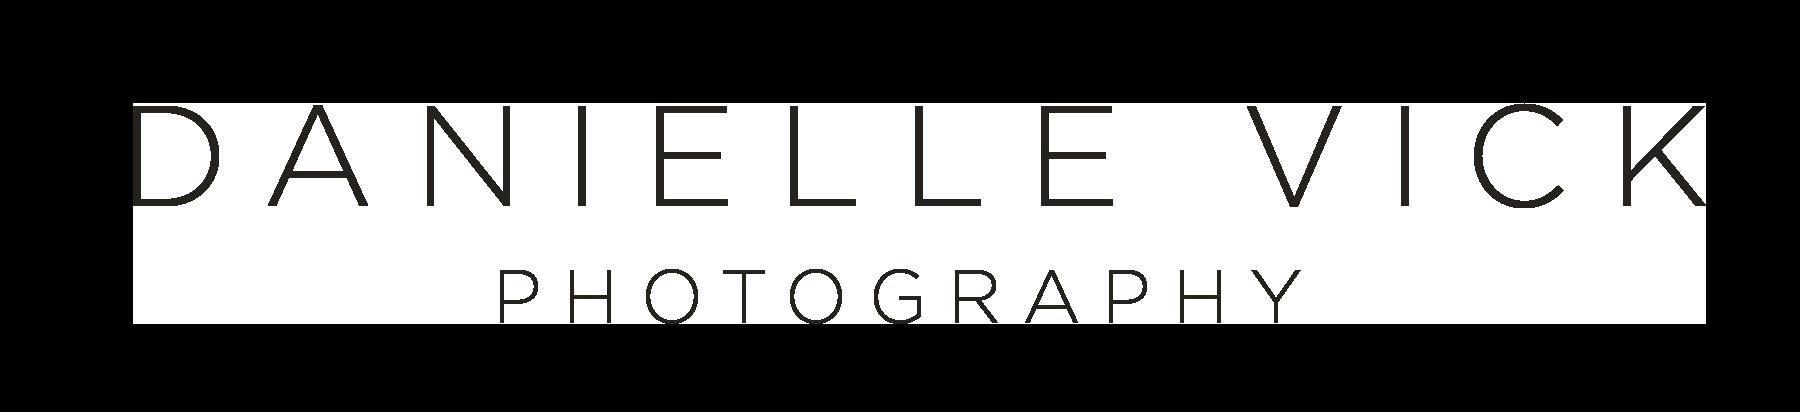 DV-photo_logo-temp-black-center.png